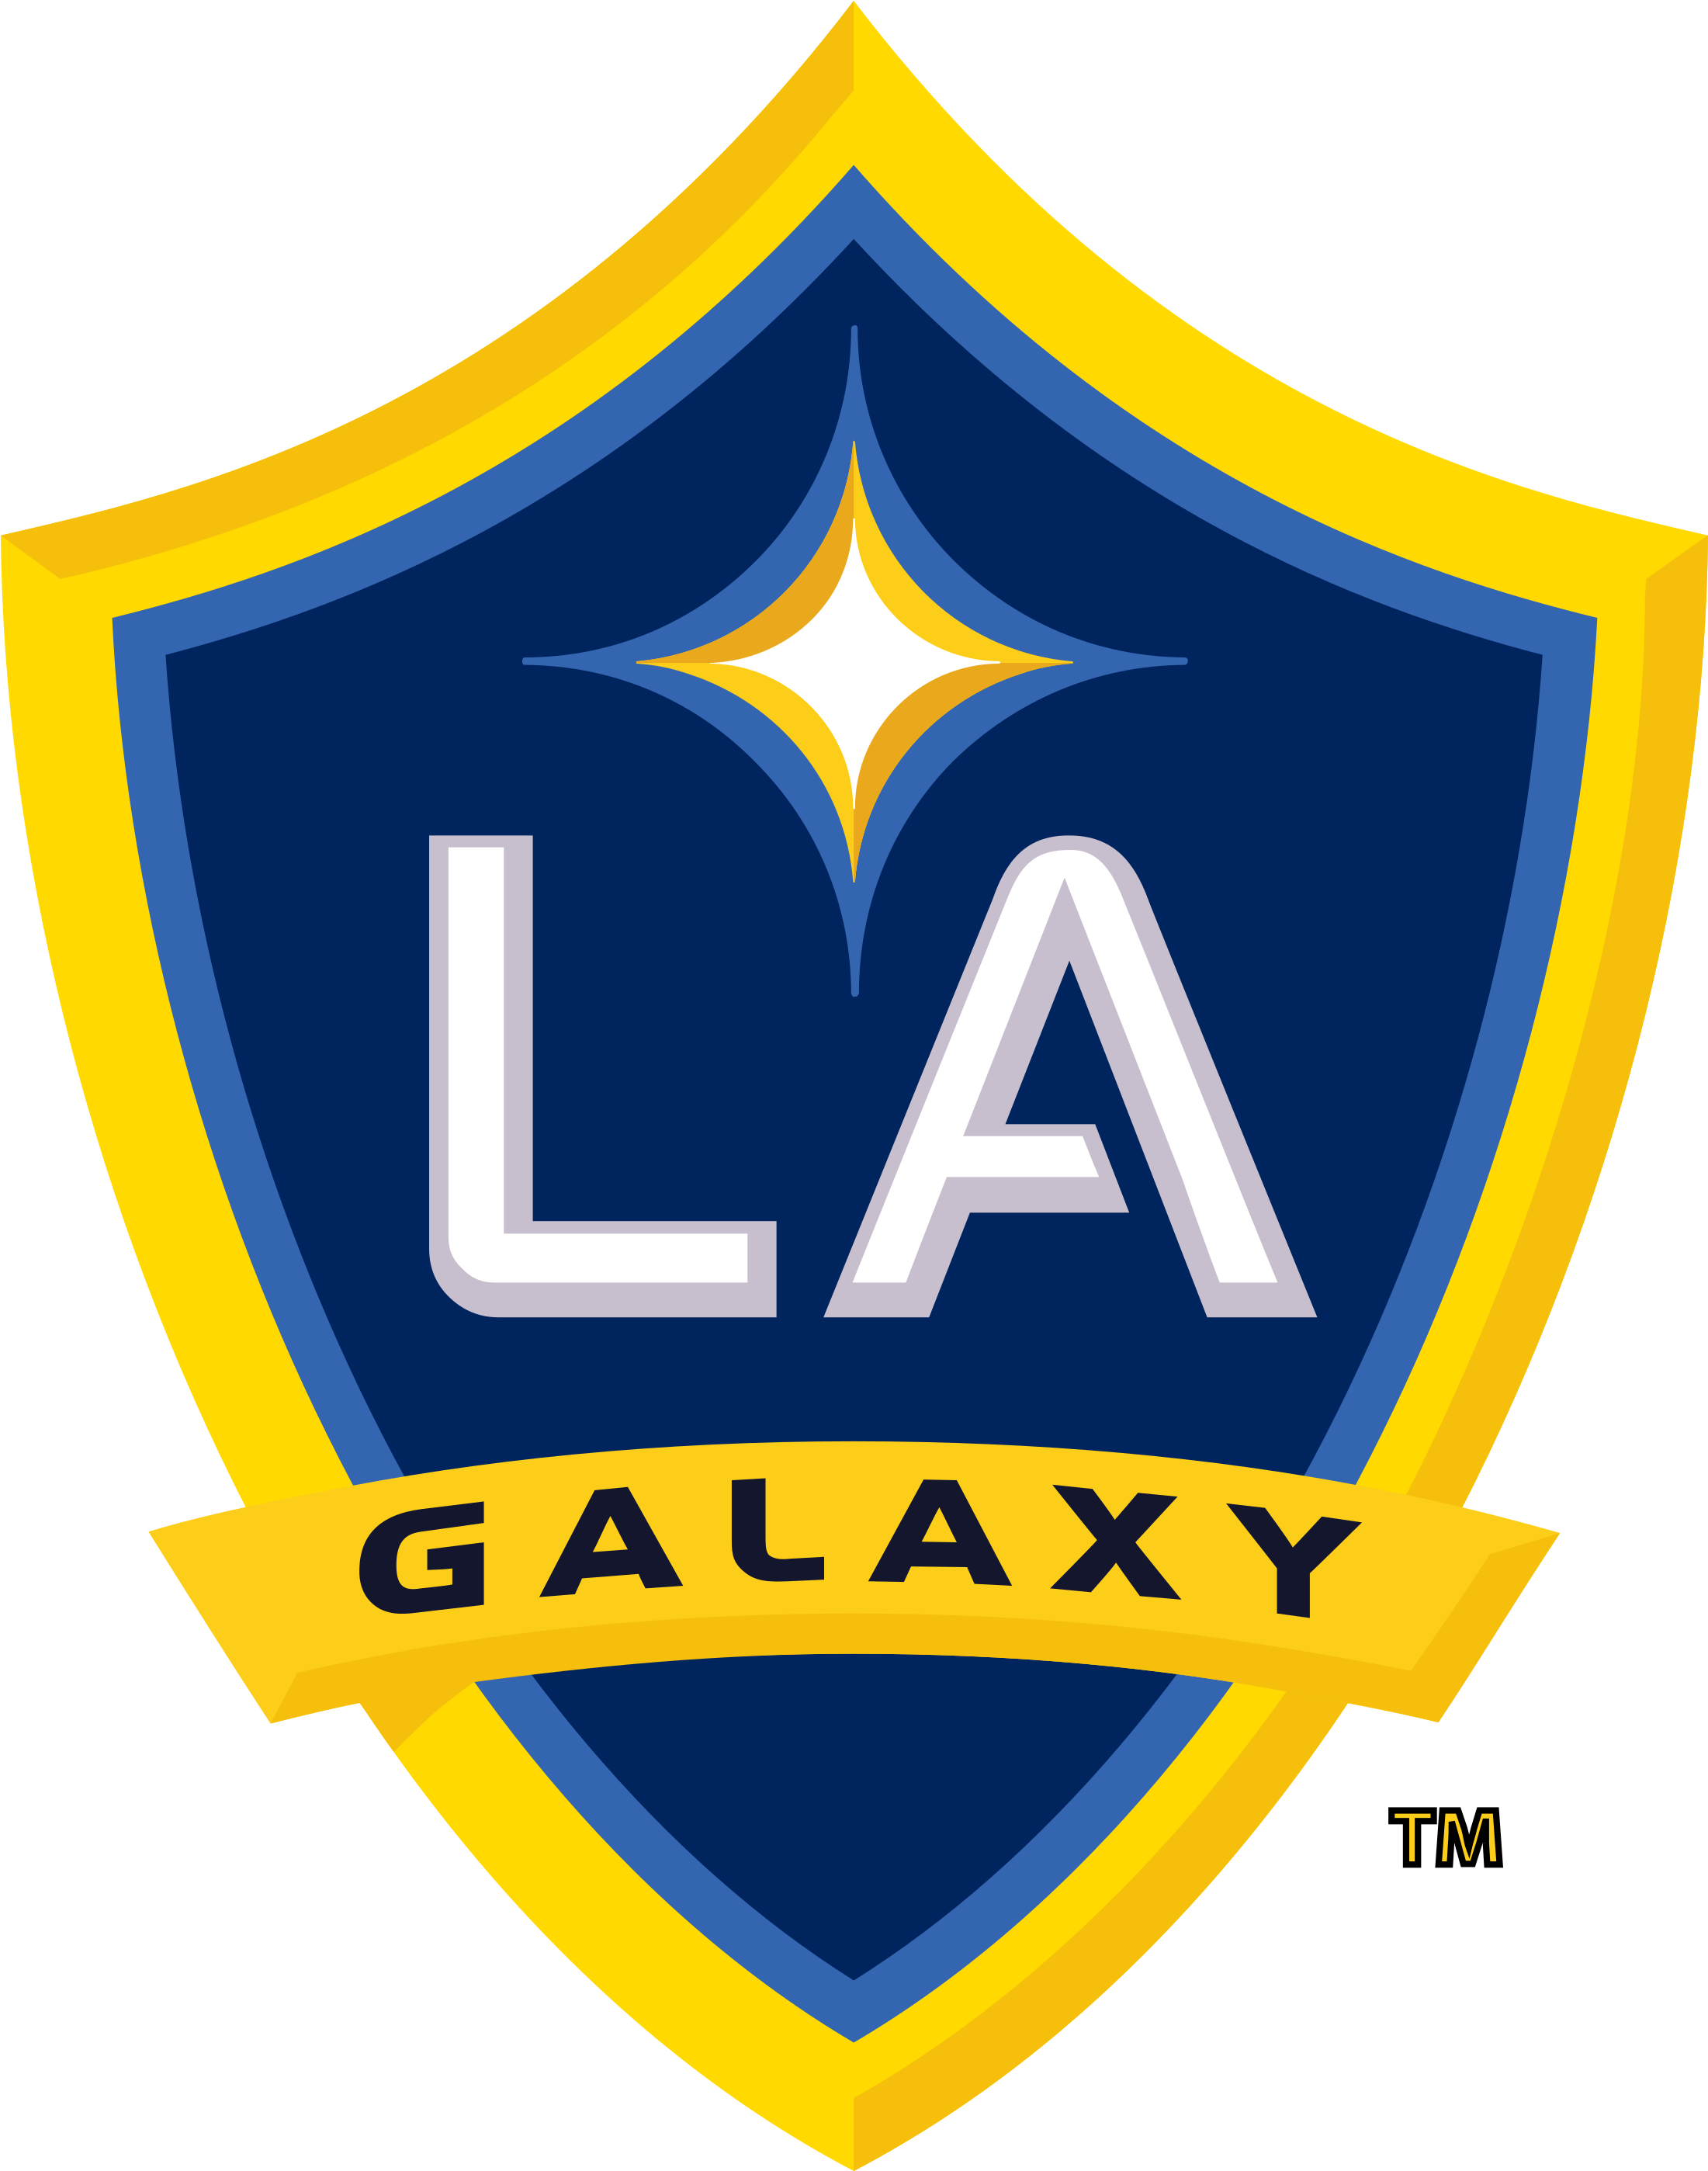 La Galaxy Betting Tips La Galaxy Logo Png Clipart Full Size Clipart 529323 Pinclipart